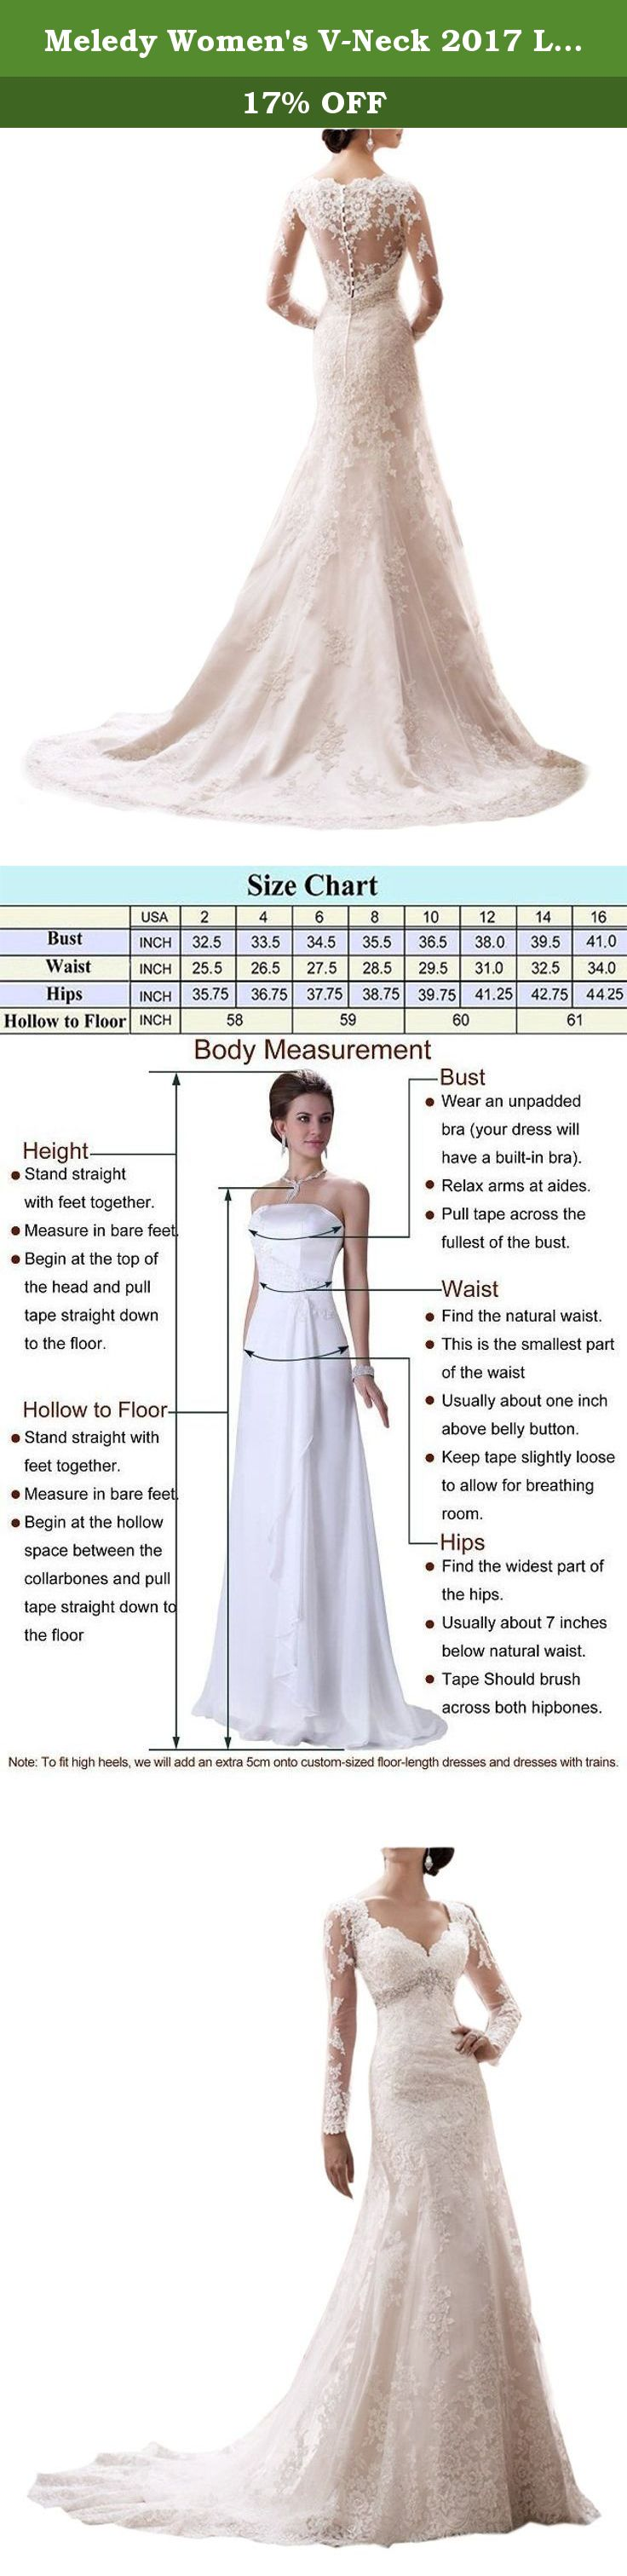 Design your own wedding dress cheap  Meledy Womenus VNeck  Long Sleeves Full Back Mermaid Wedding